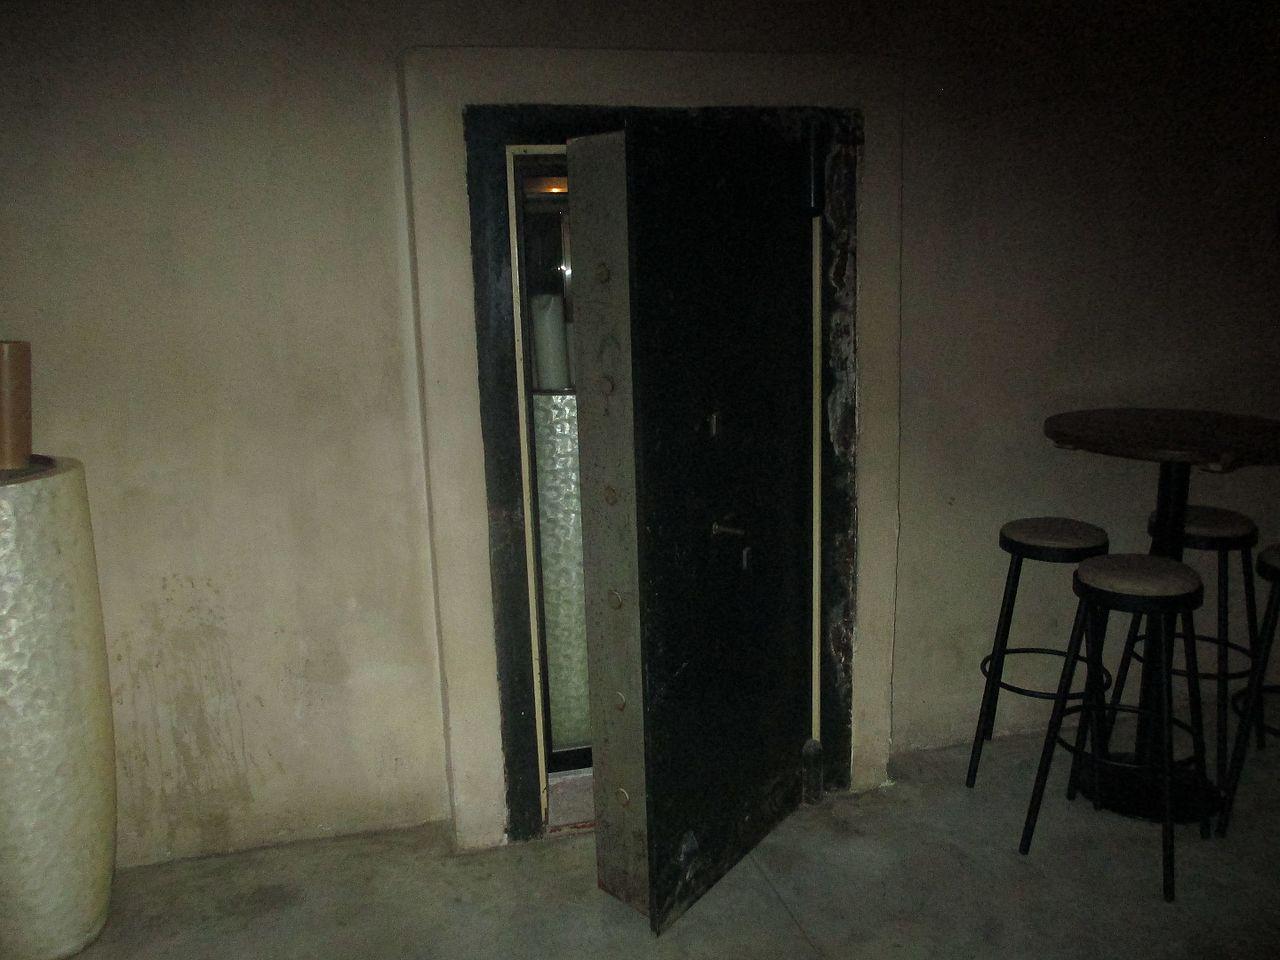 File:Safe room door in Sarona Compound.jpg - Wikimedia Commons